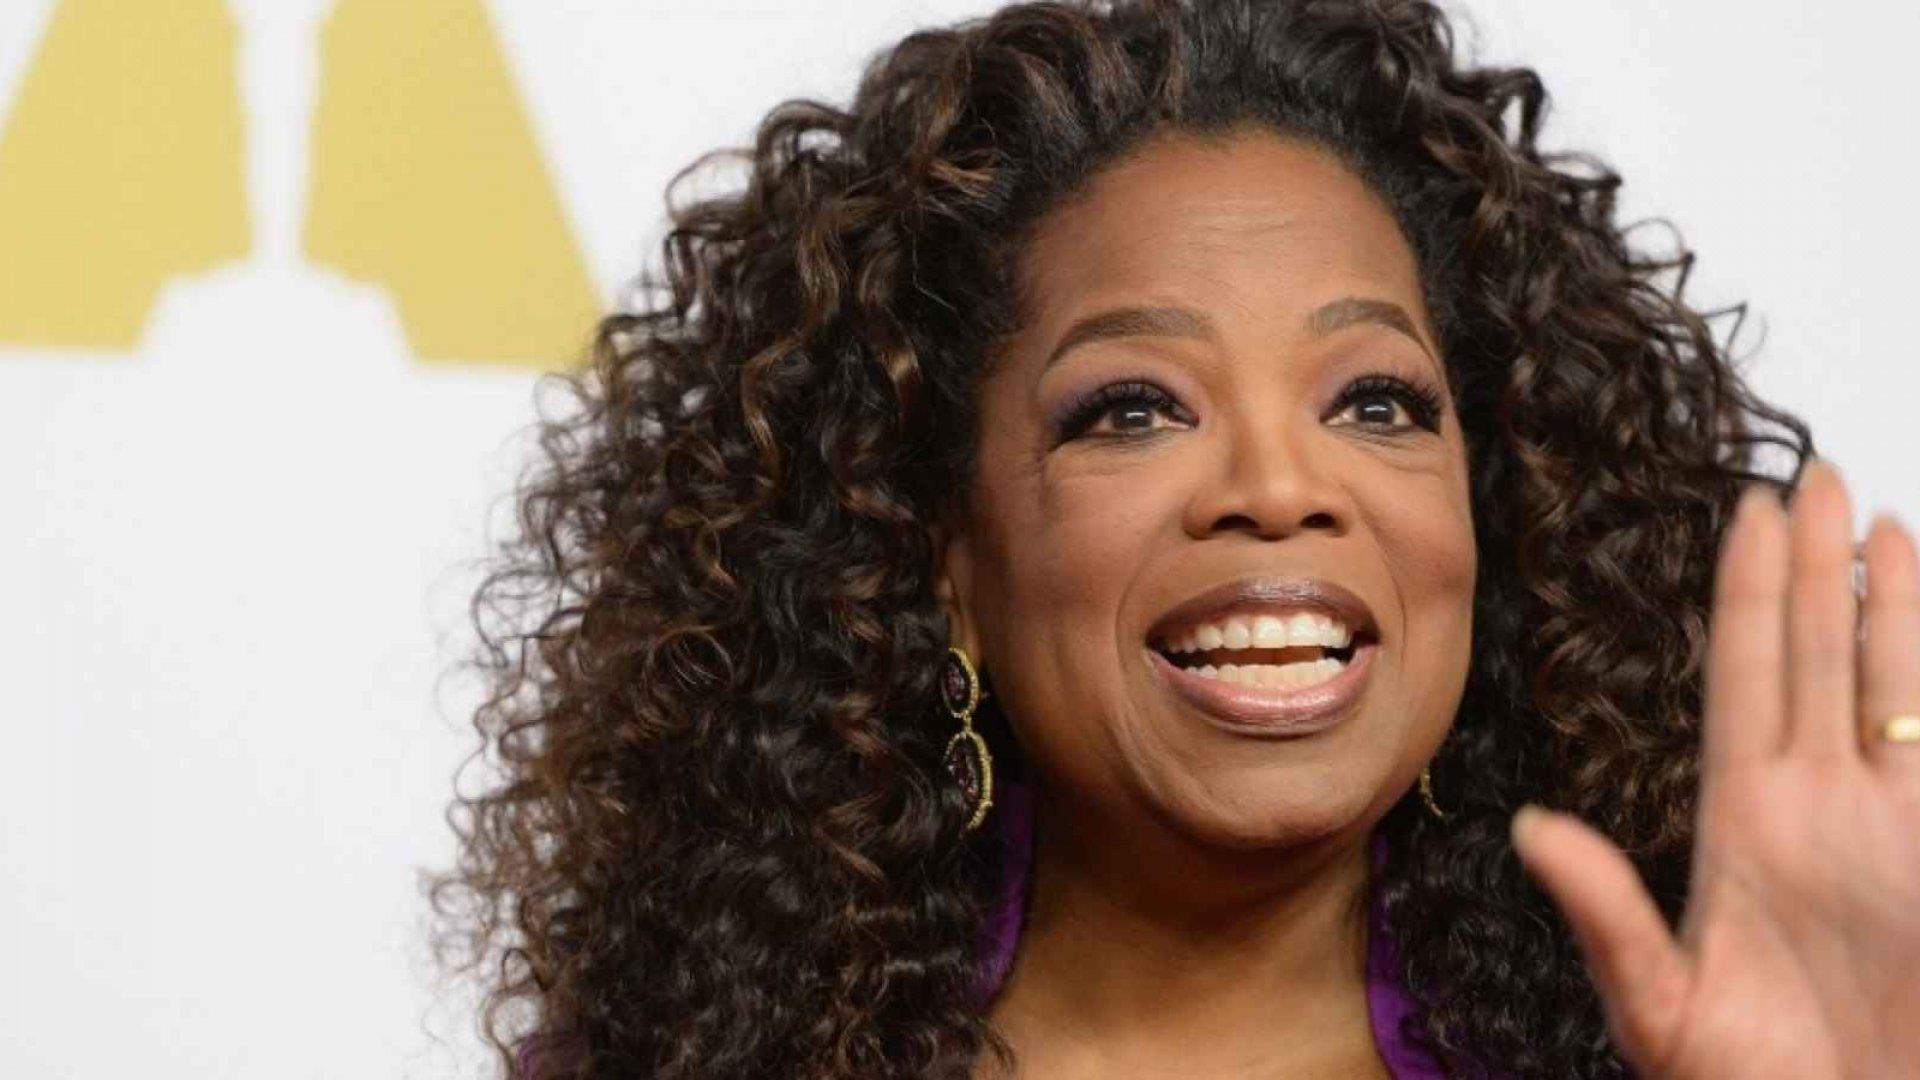 18 Cool Facts About Oprah Winfrey